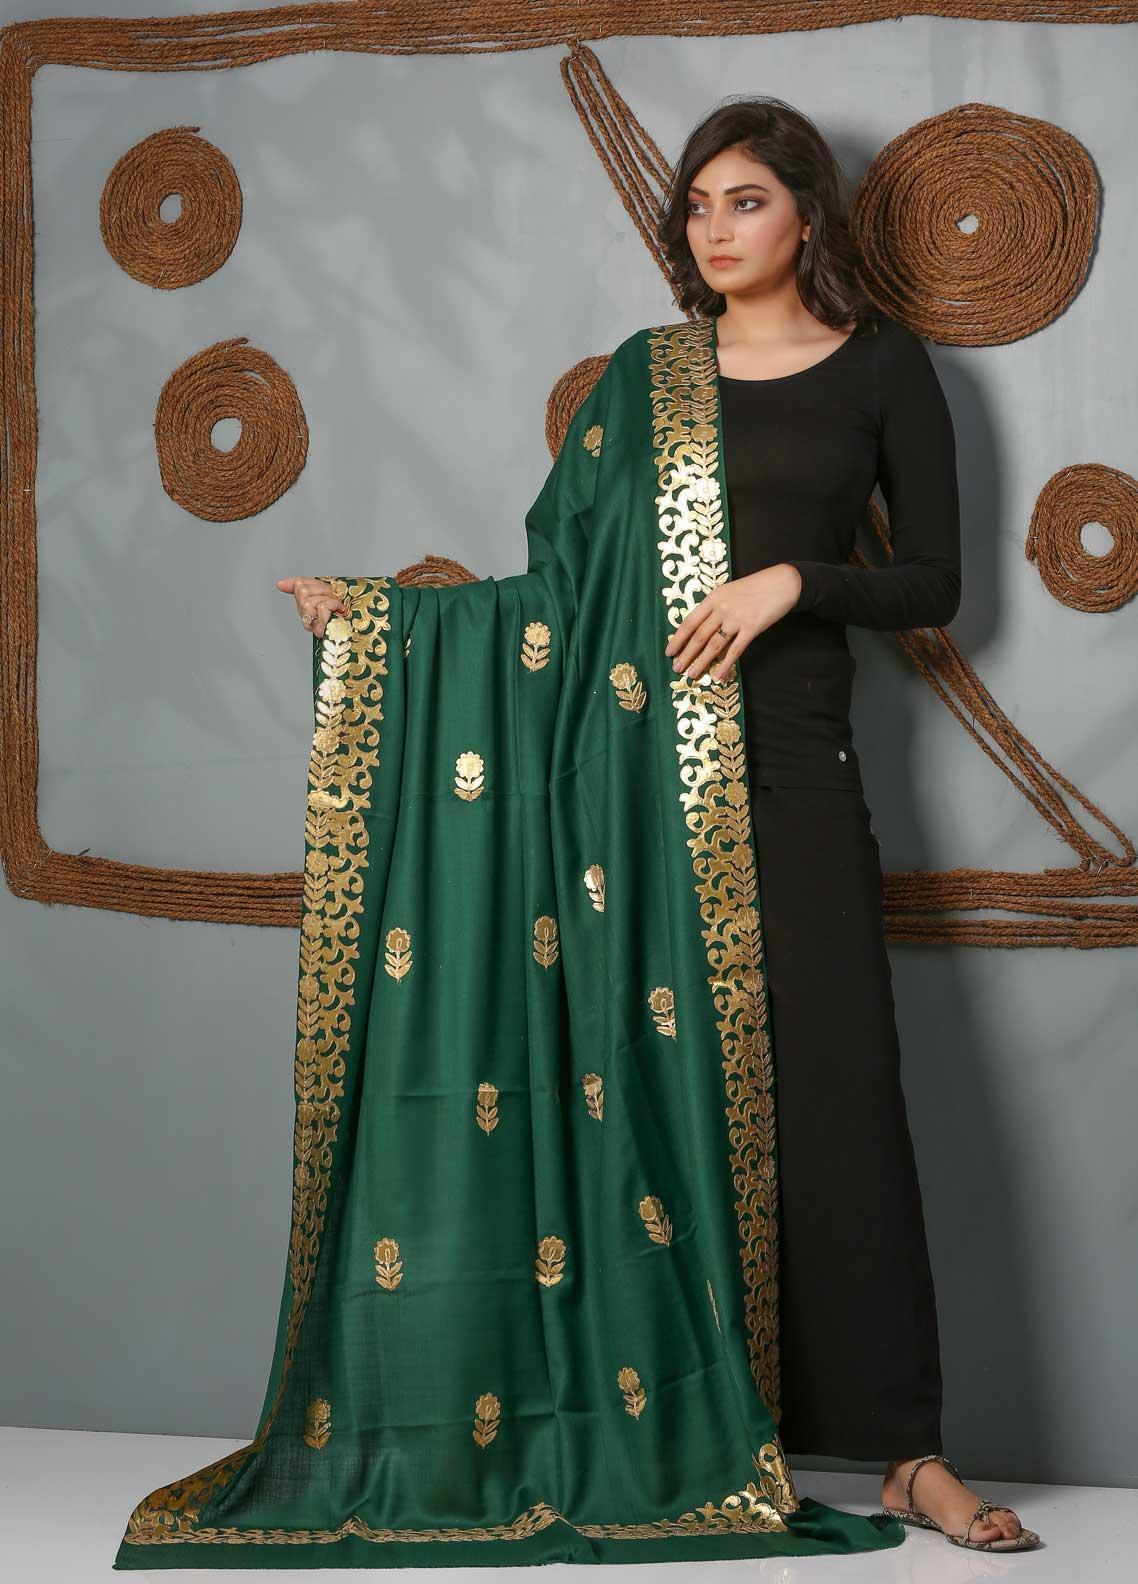 Sanaulla Exclusive Range Embroidered Pashmina  Shawl SU21PS 323967 - Pashmina Shawls